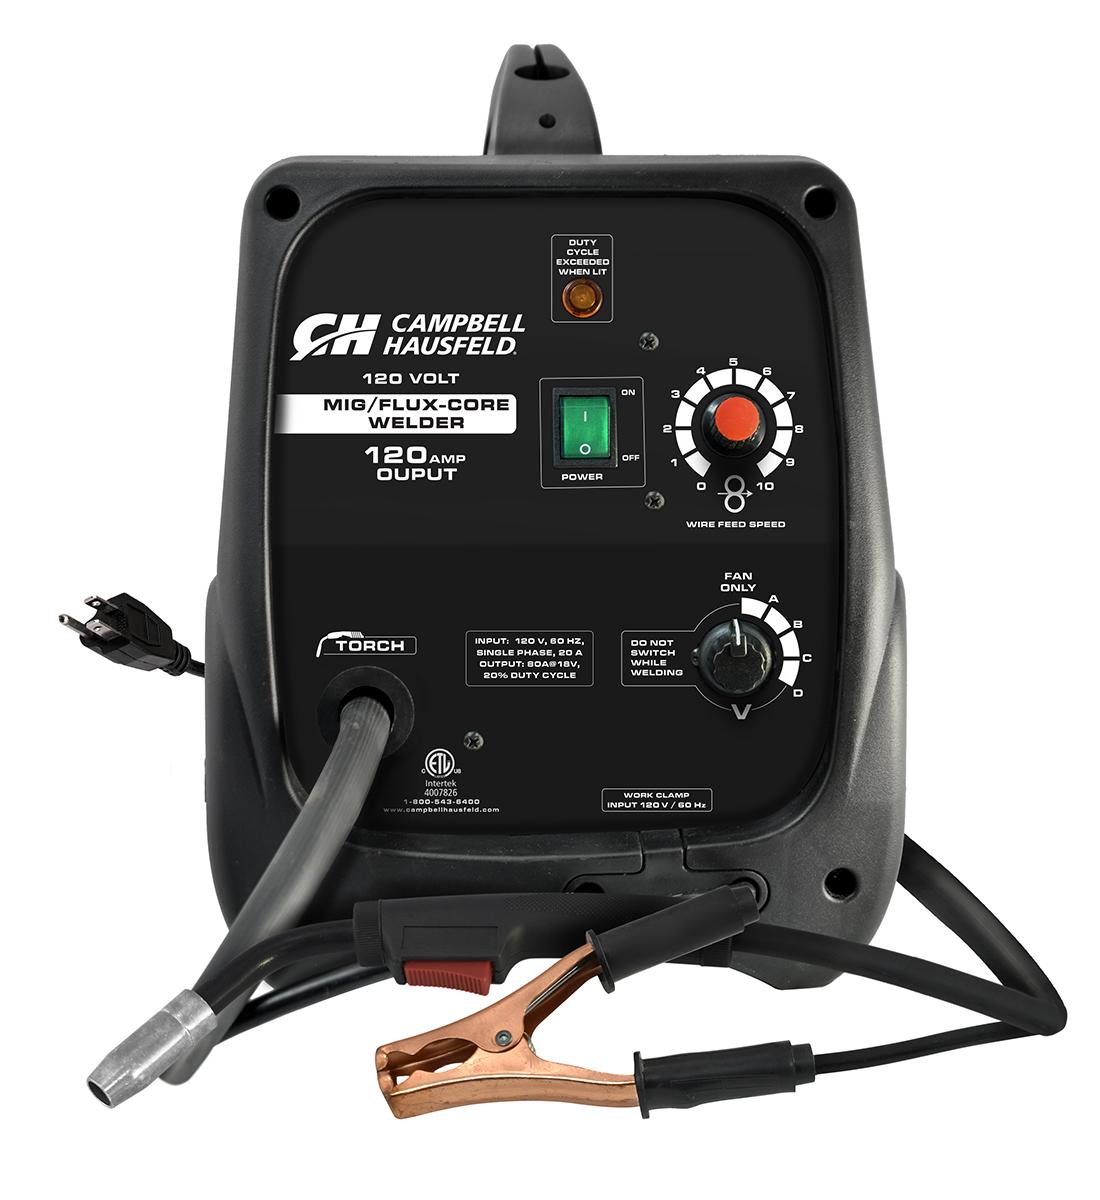 Mig Flux Core Welder 120 Amps With Accessories Dw313000 Parts Cored